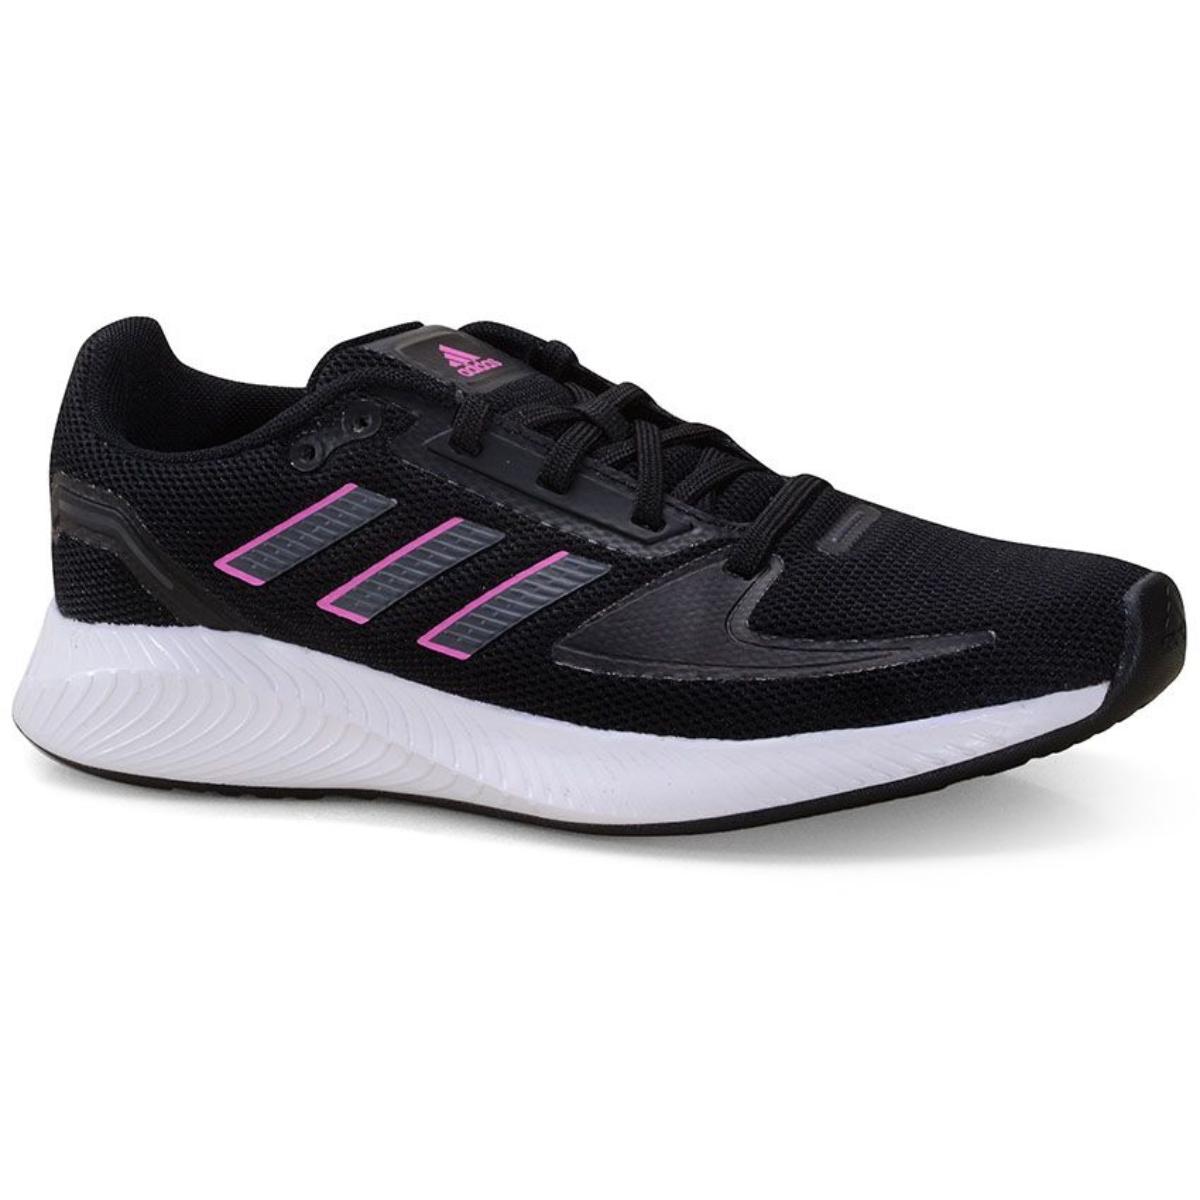 Tênis Feminino Adidas Fy9624 Runfalcon Preto/rosa